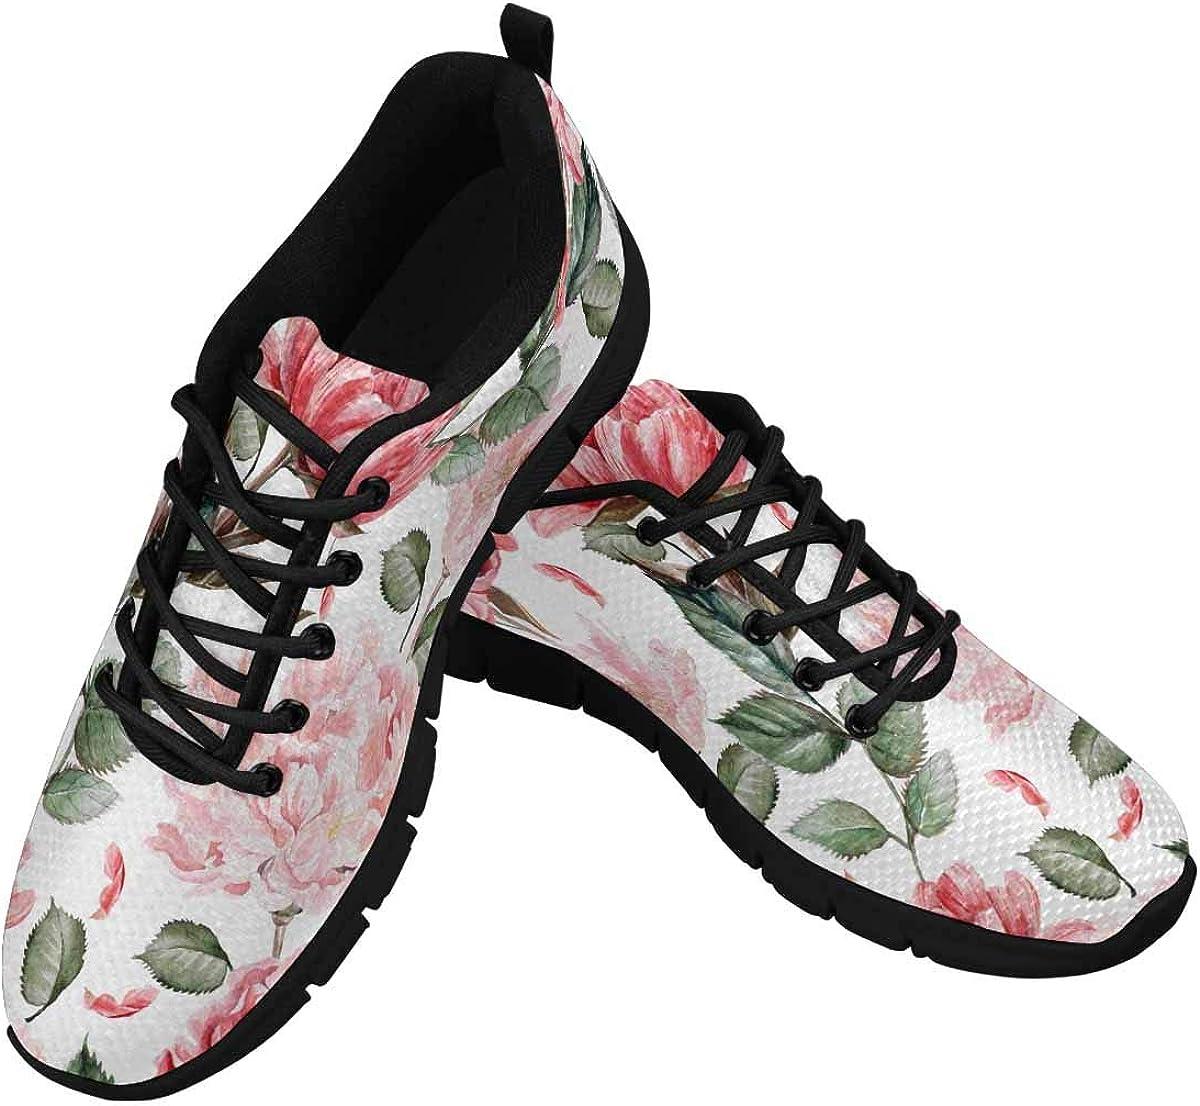 INTERESTPRINT Watercolor Peony Red Flowers Women's Tennis Running Shoes Lightweight Sneakers